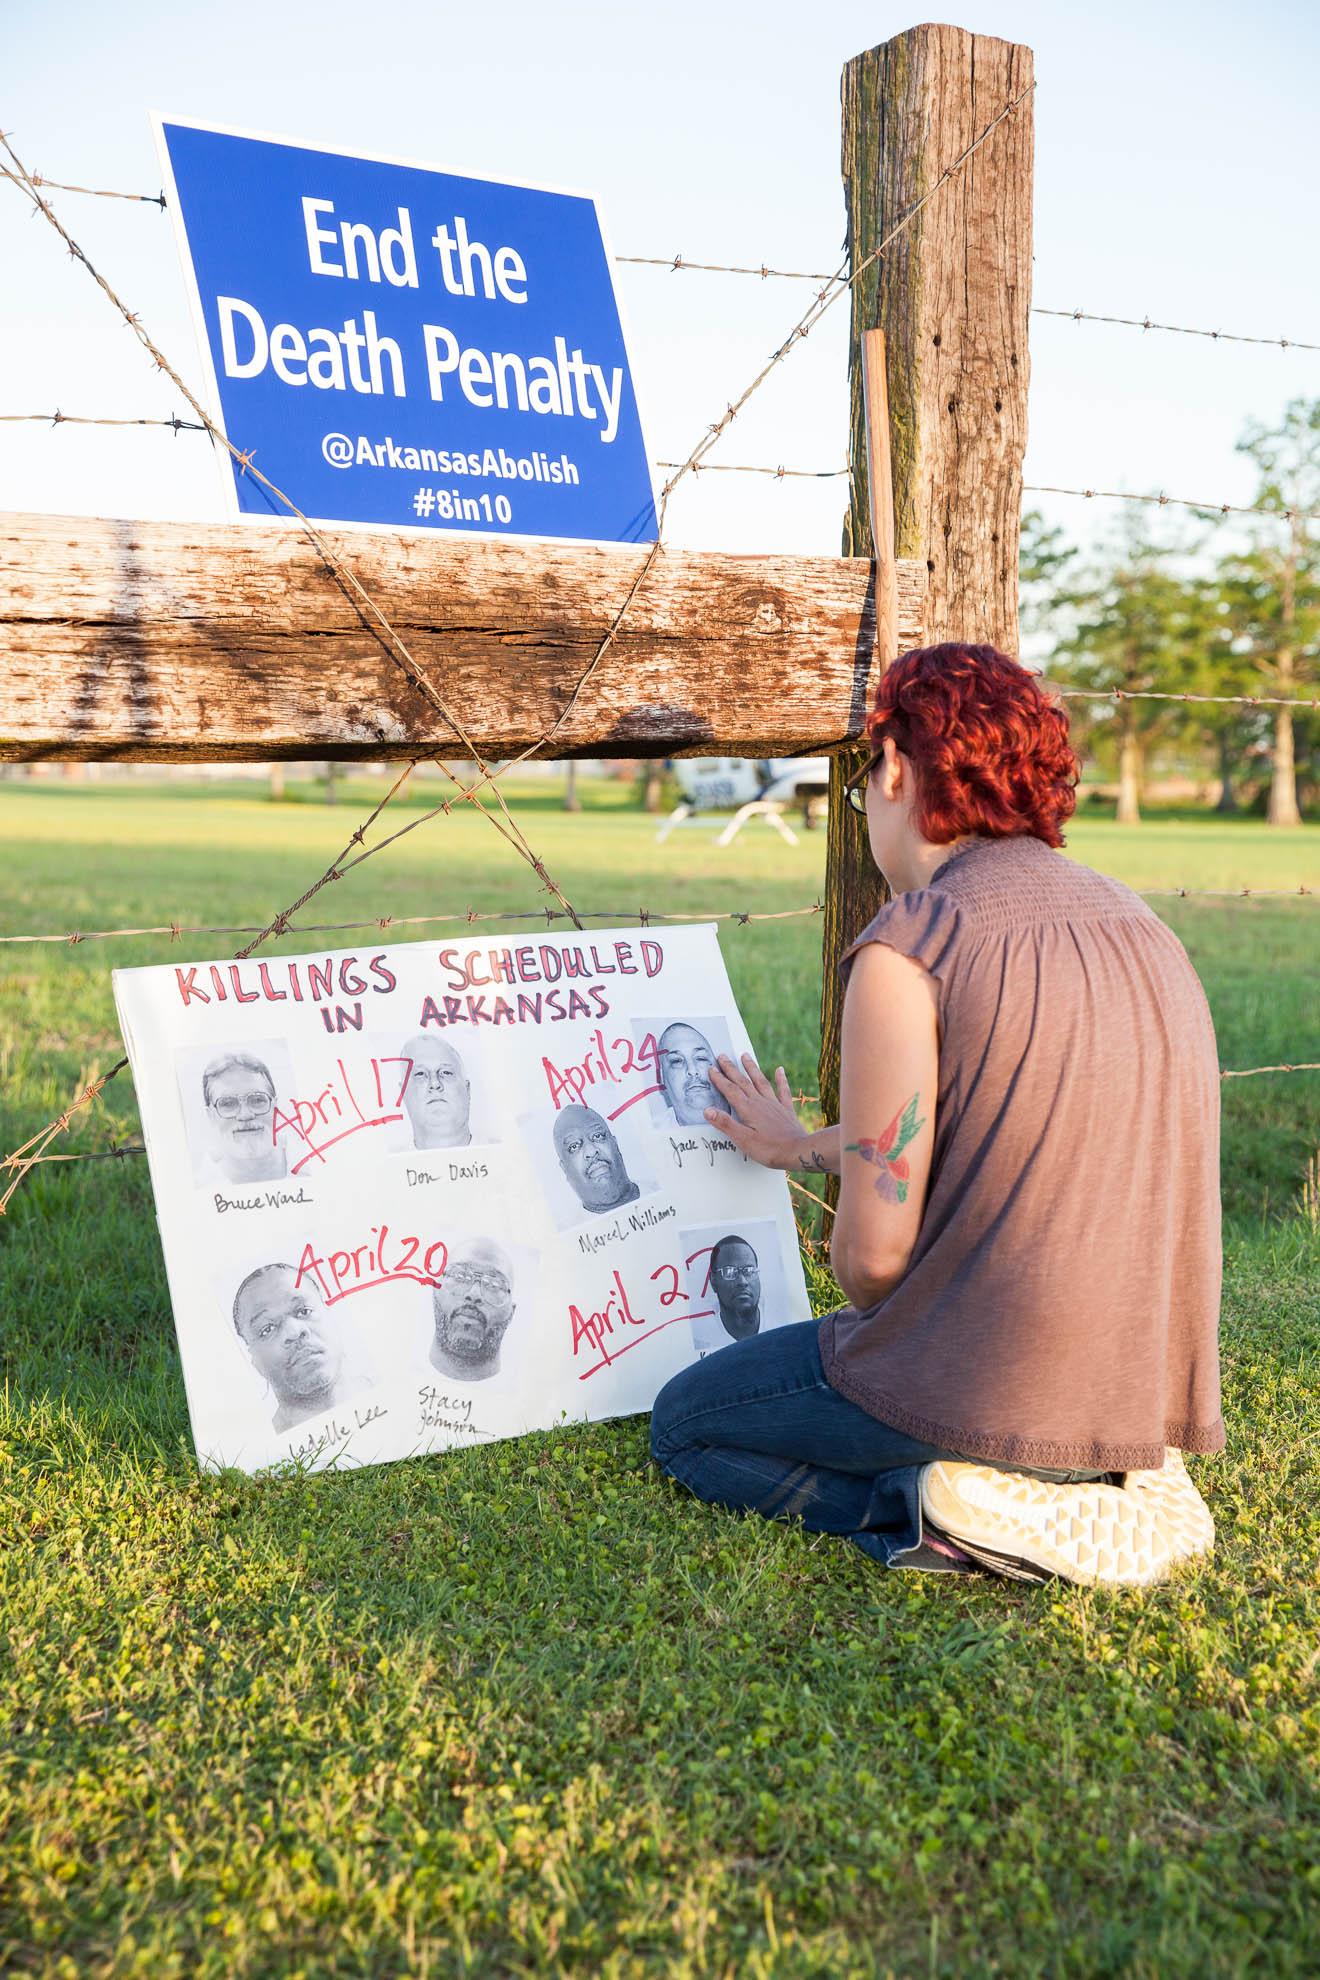 death penalty, photography, photos, executions, prisons, documentary, arkansas